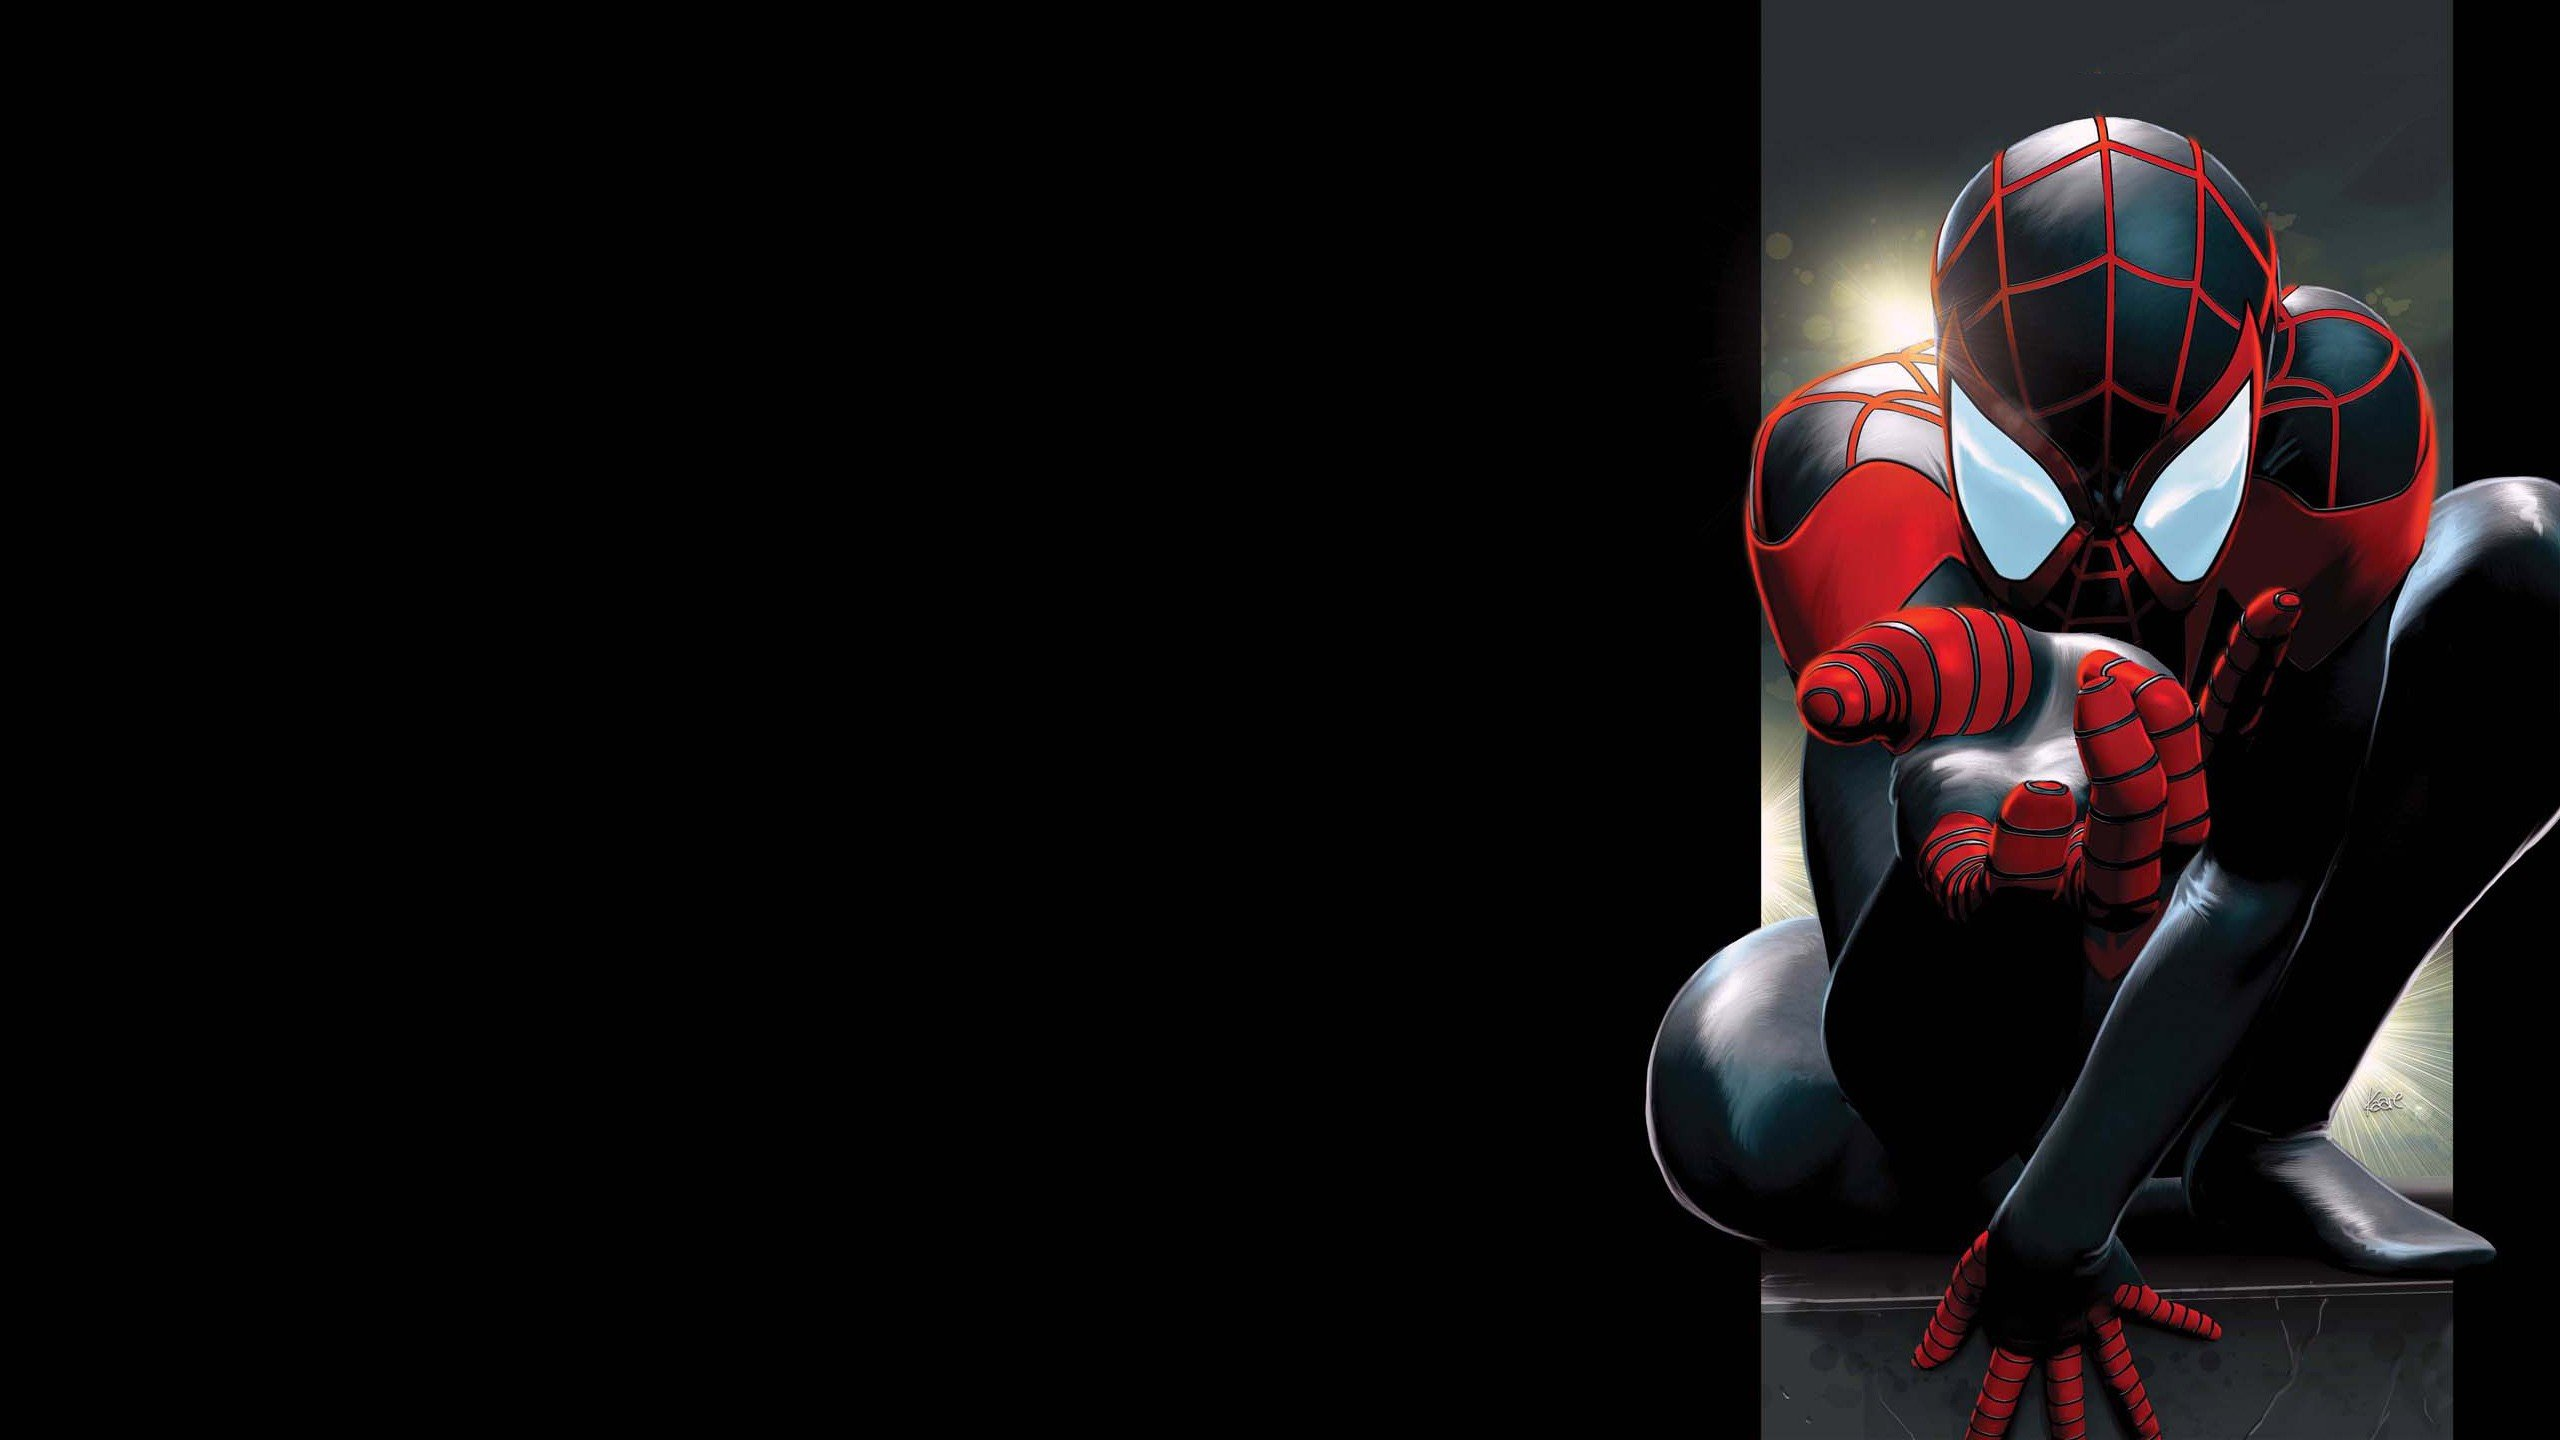 marvel comics wallpaper spider - photo #32